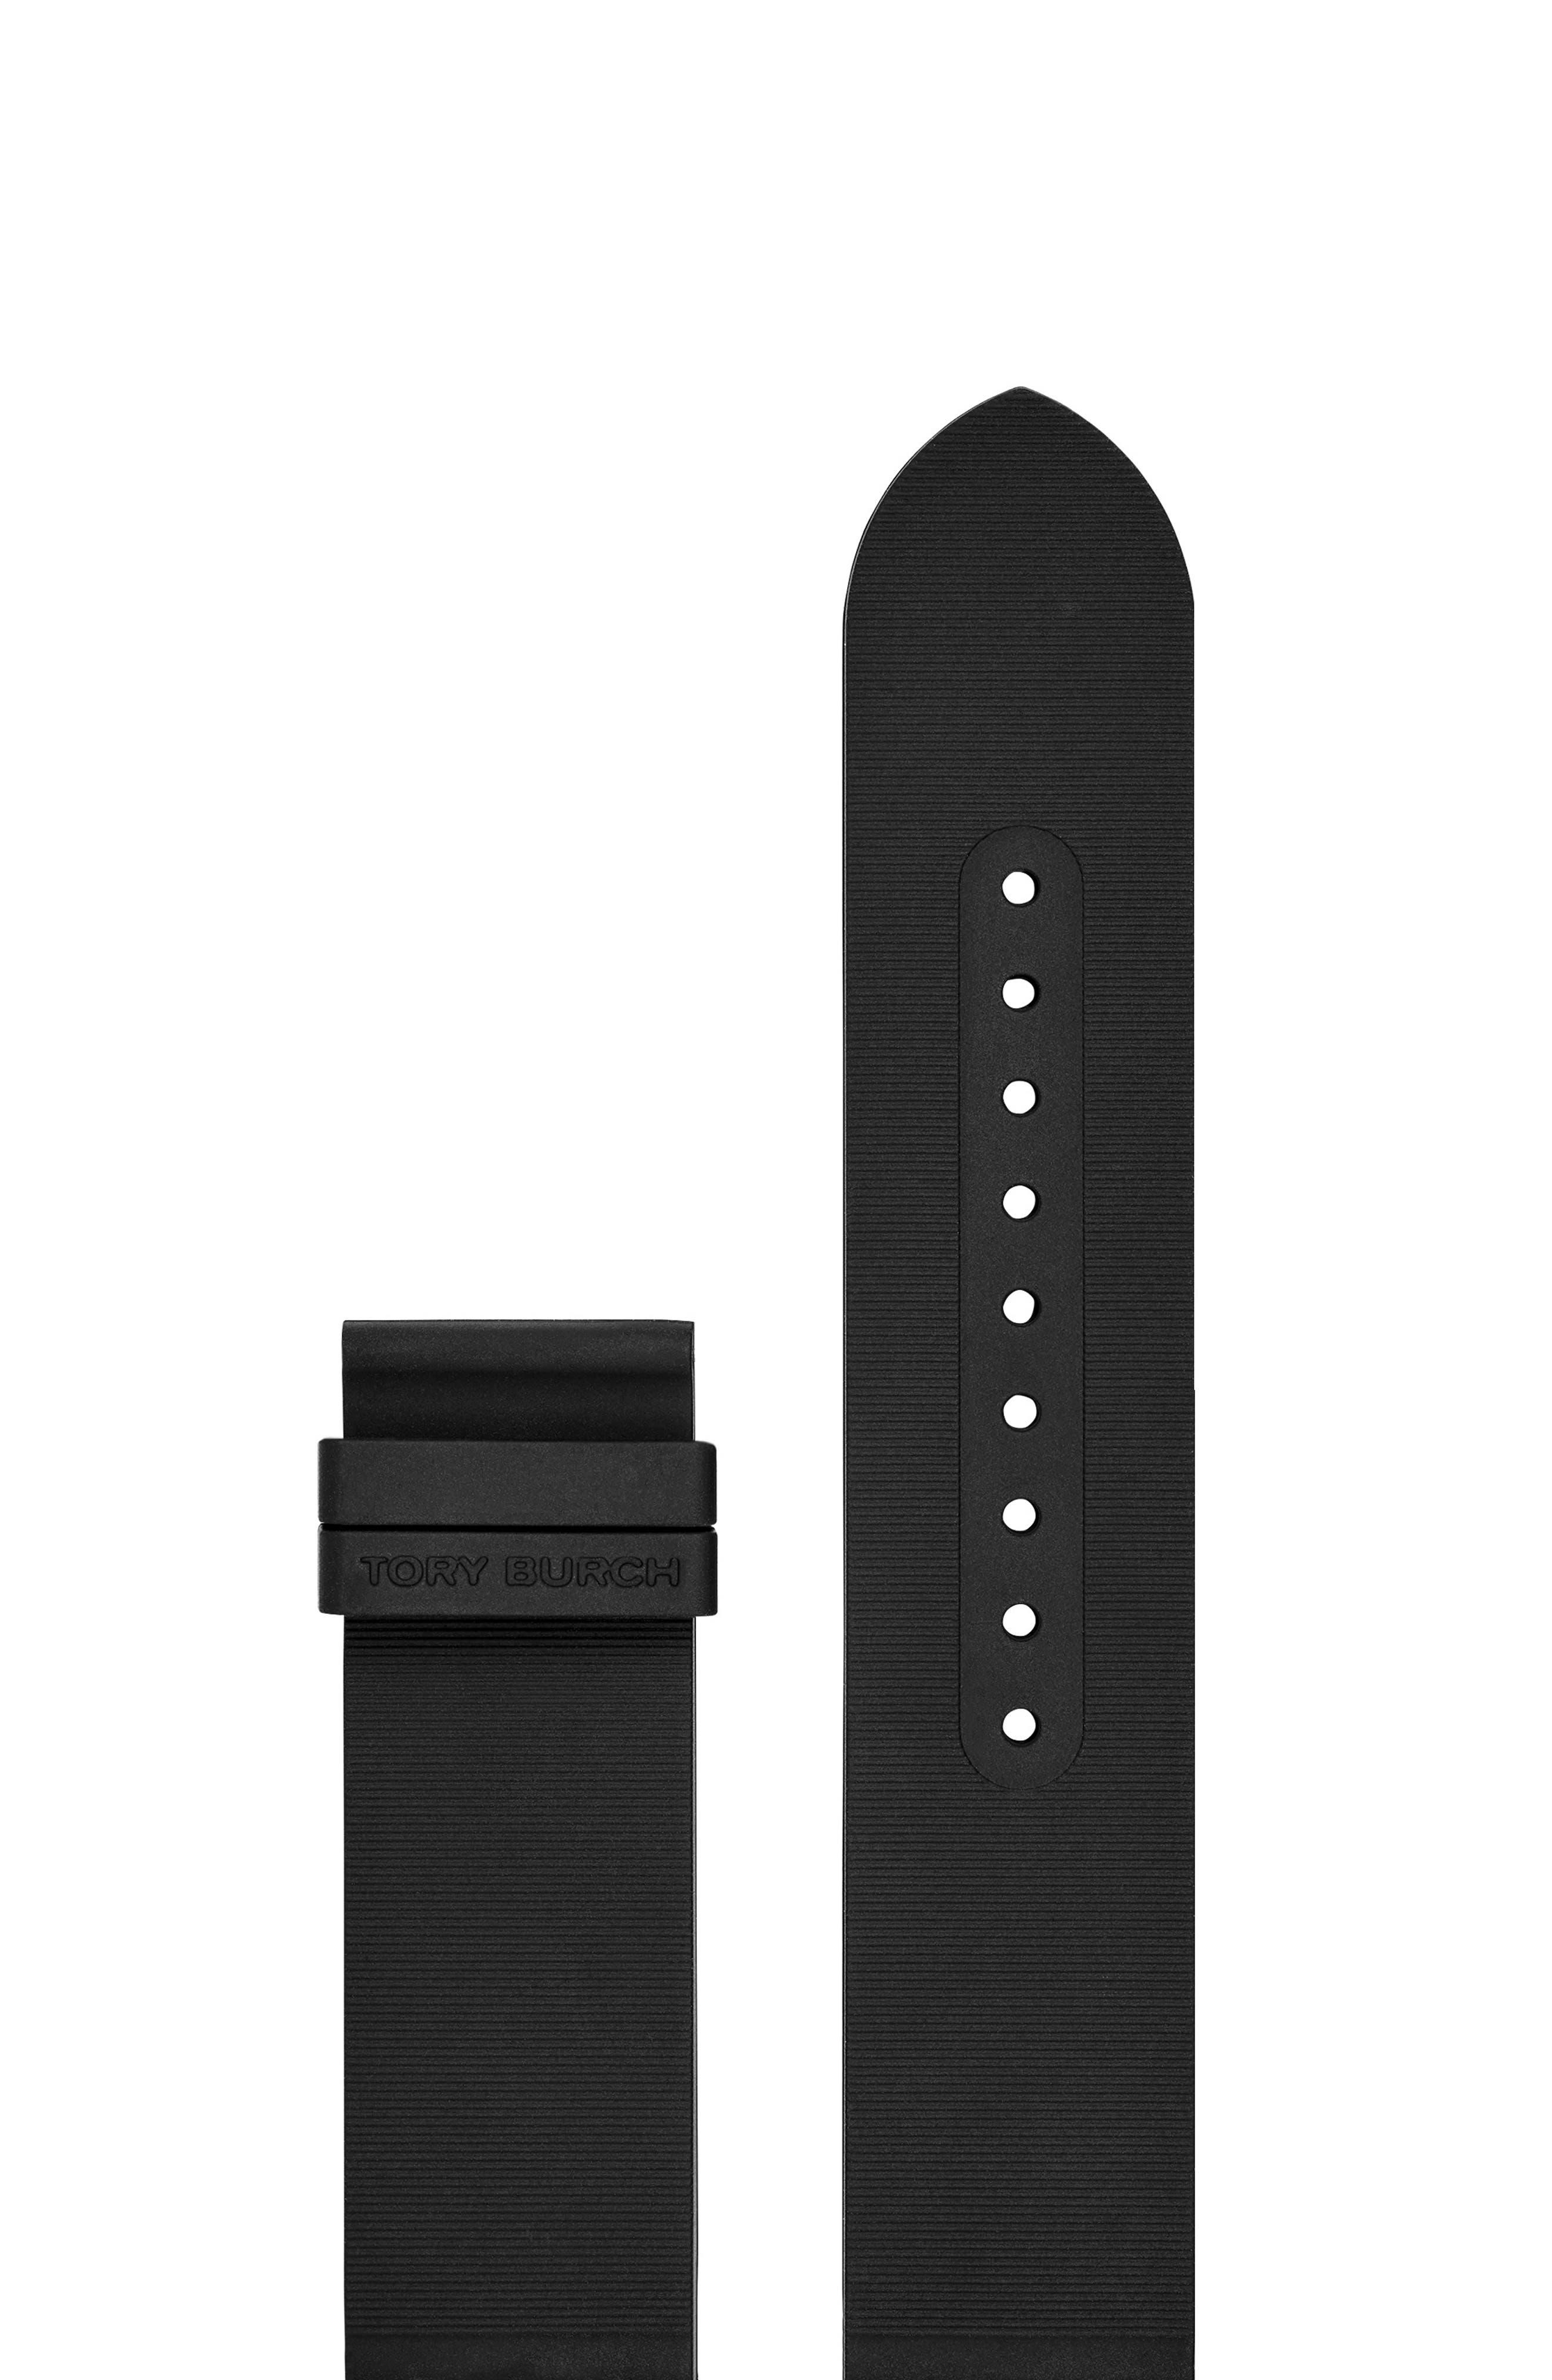 Gigi Touchscreen Smartwatch Strap, Rubber, 20 Mm in Black